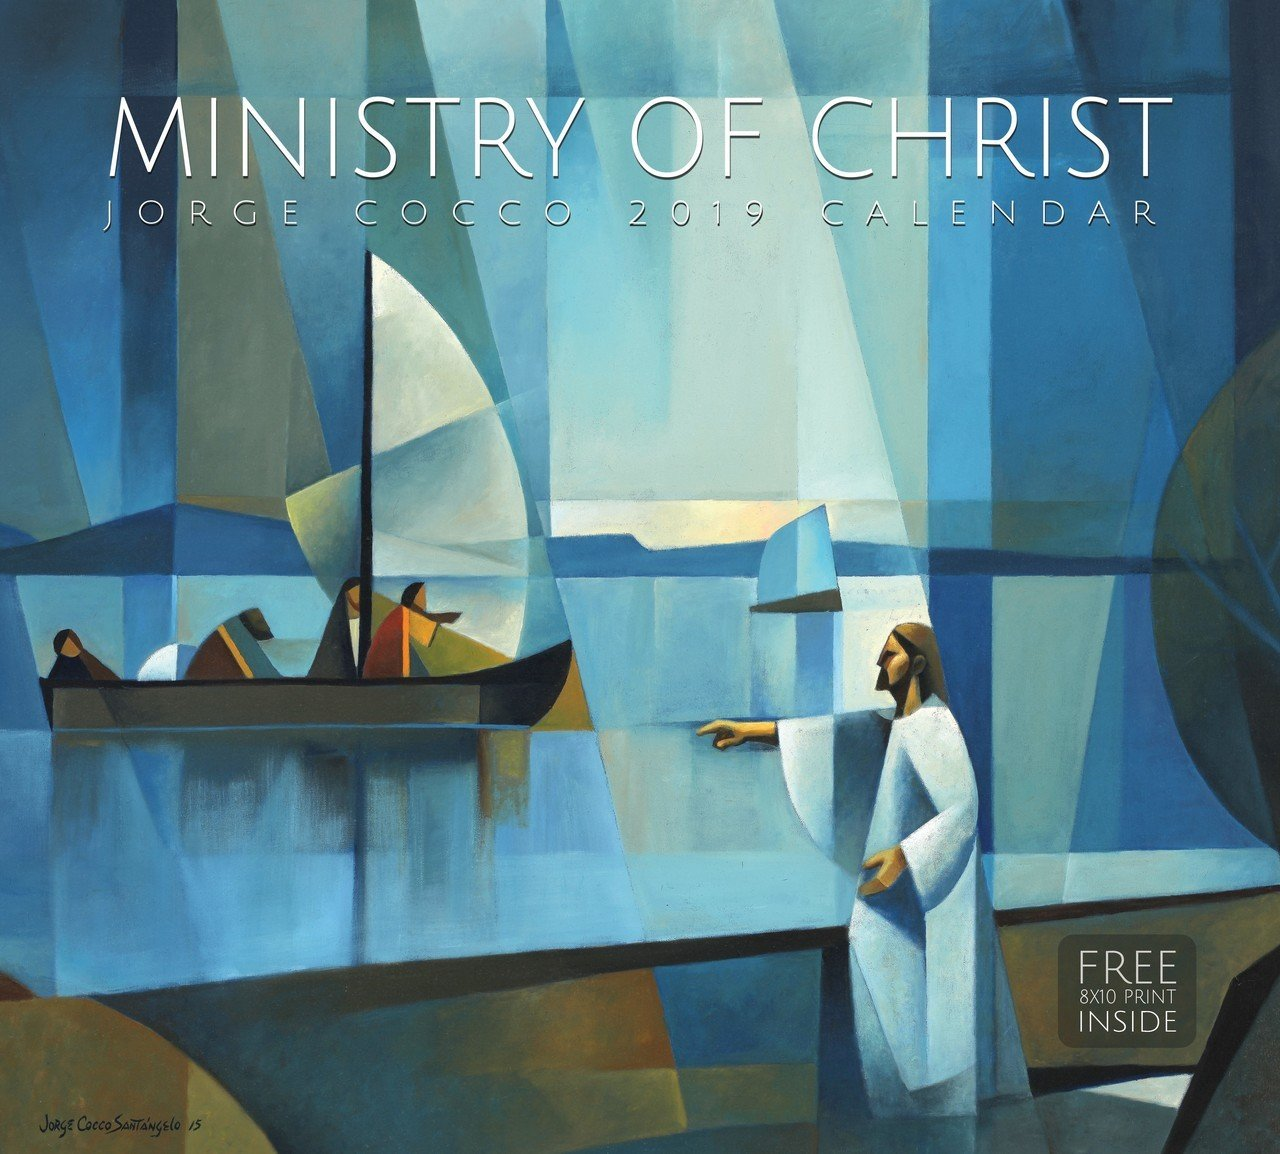 2019 Jorge Cocco Calendar - Ministry of Christ